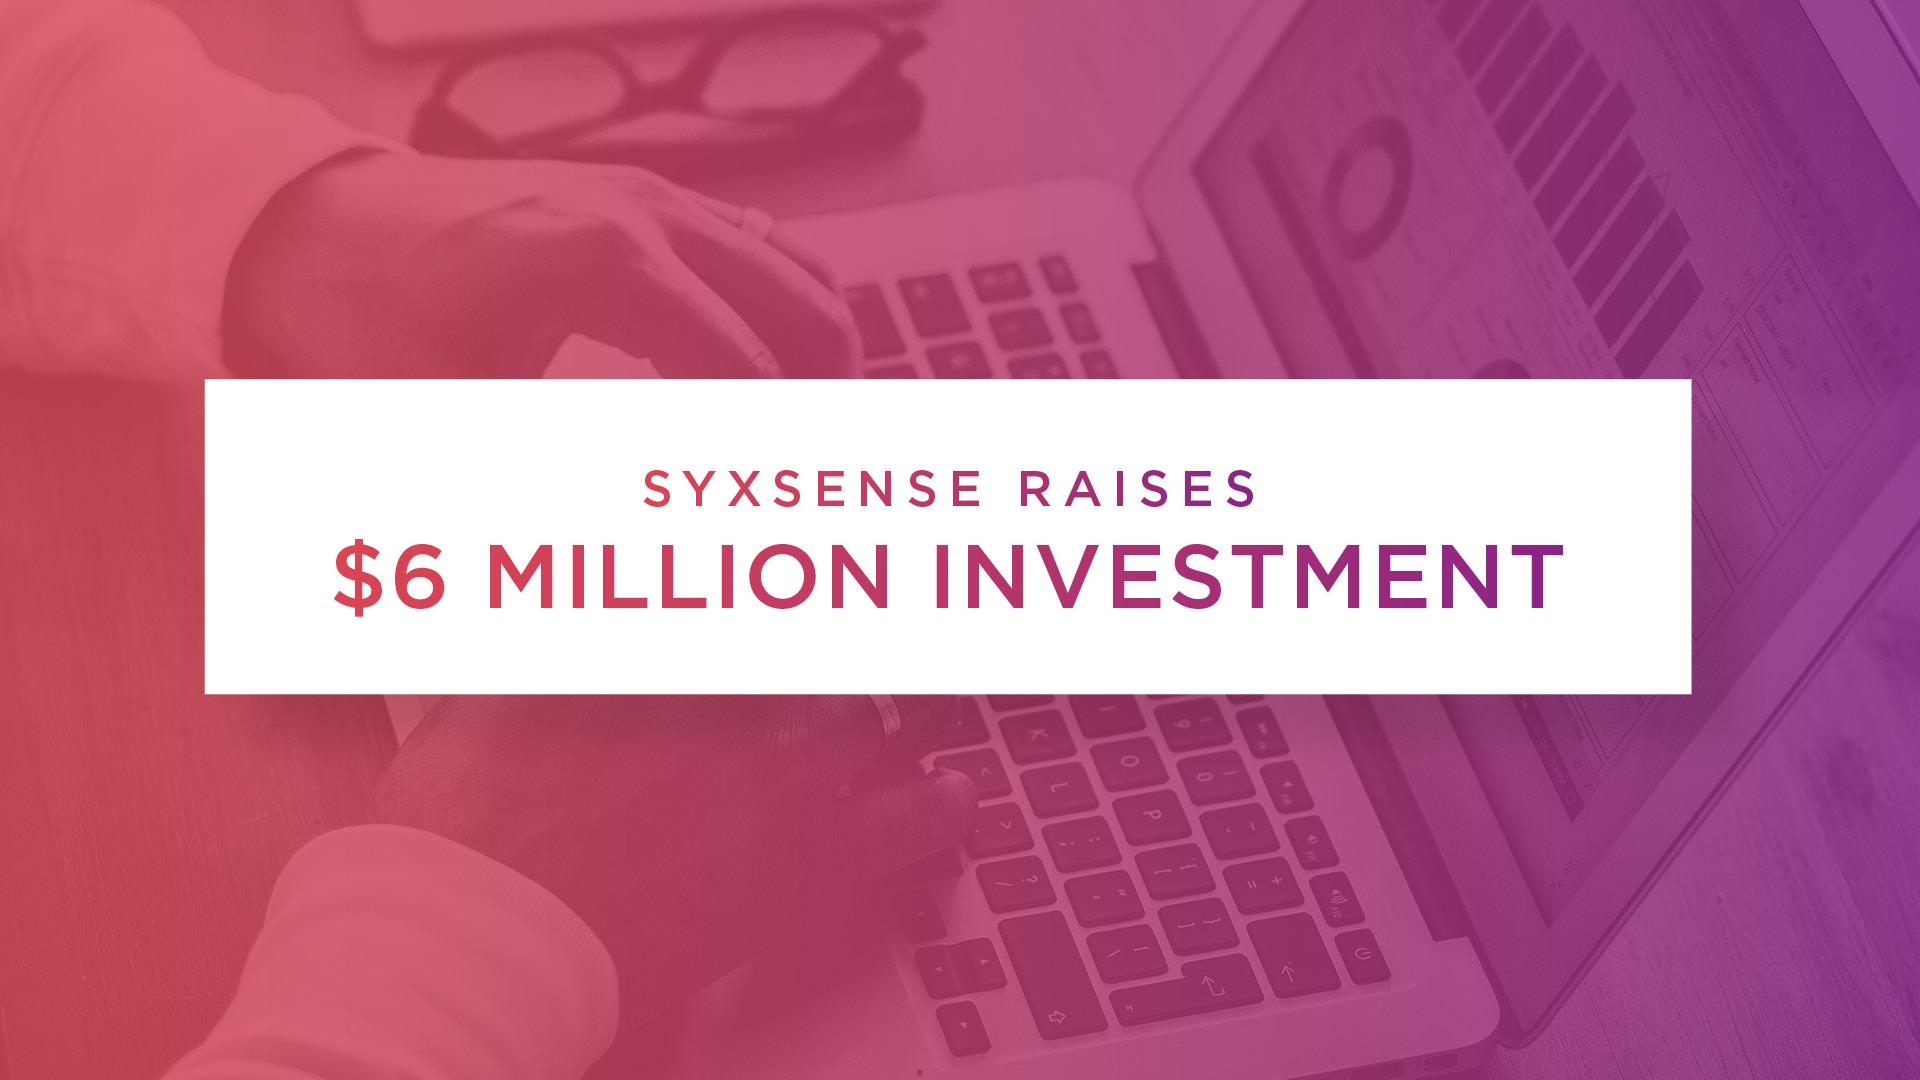 Syxsense Raises $6M in New Investment